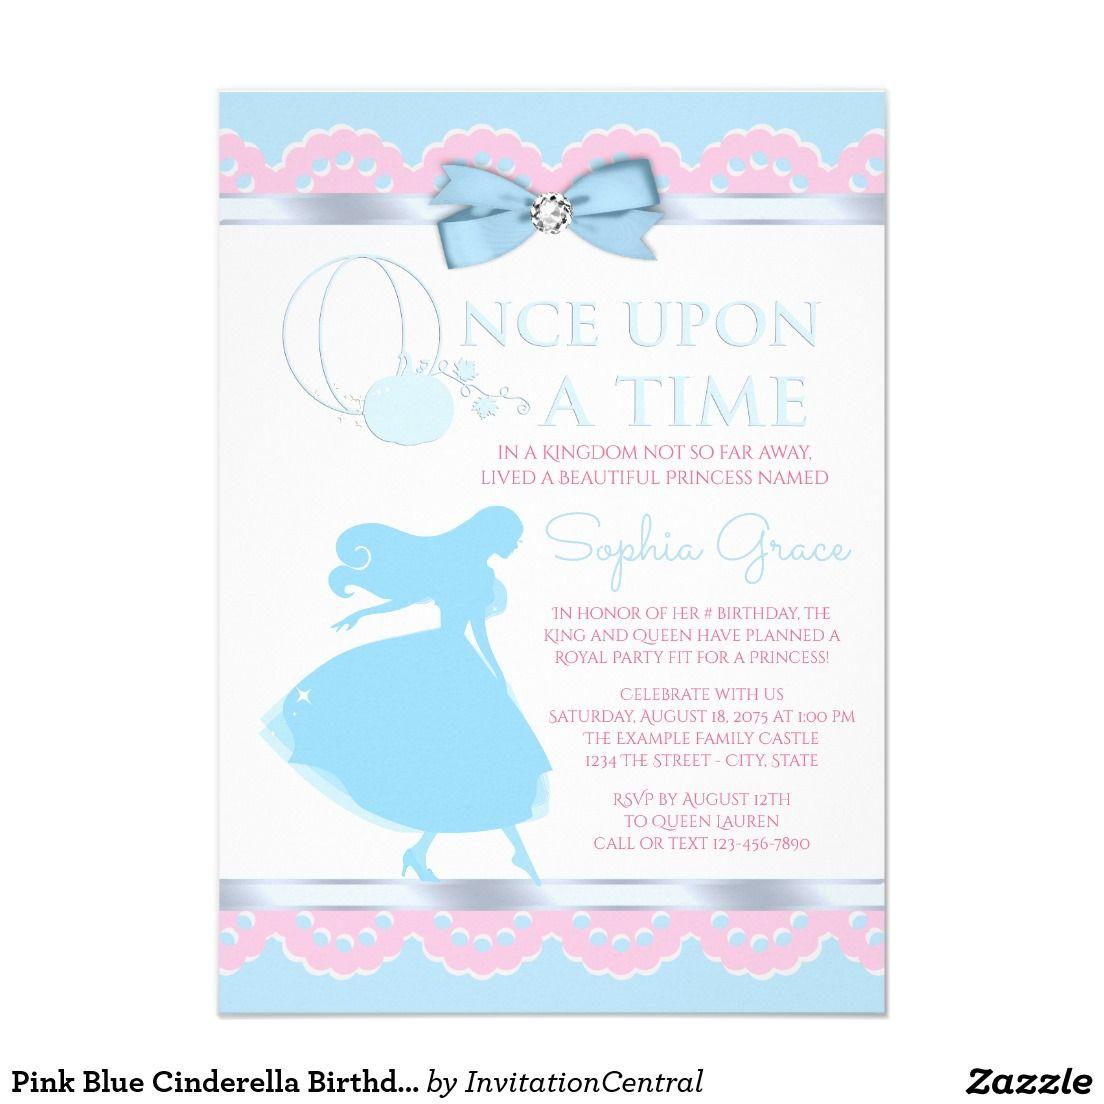 Pink Blue Cinderella Birthday Party Invitation   Kids Birthday Party ...